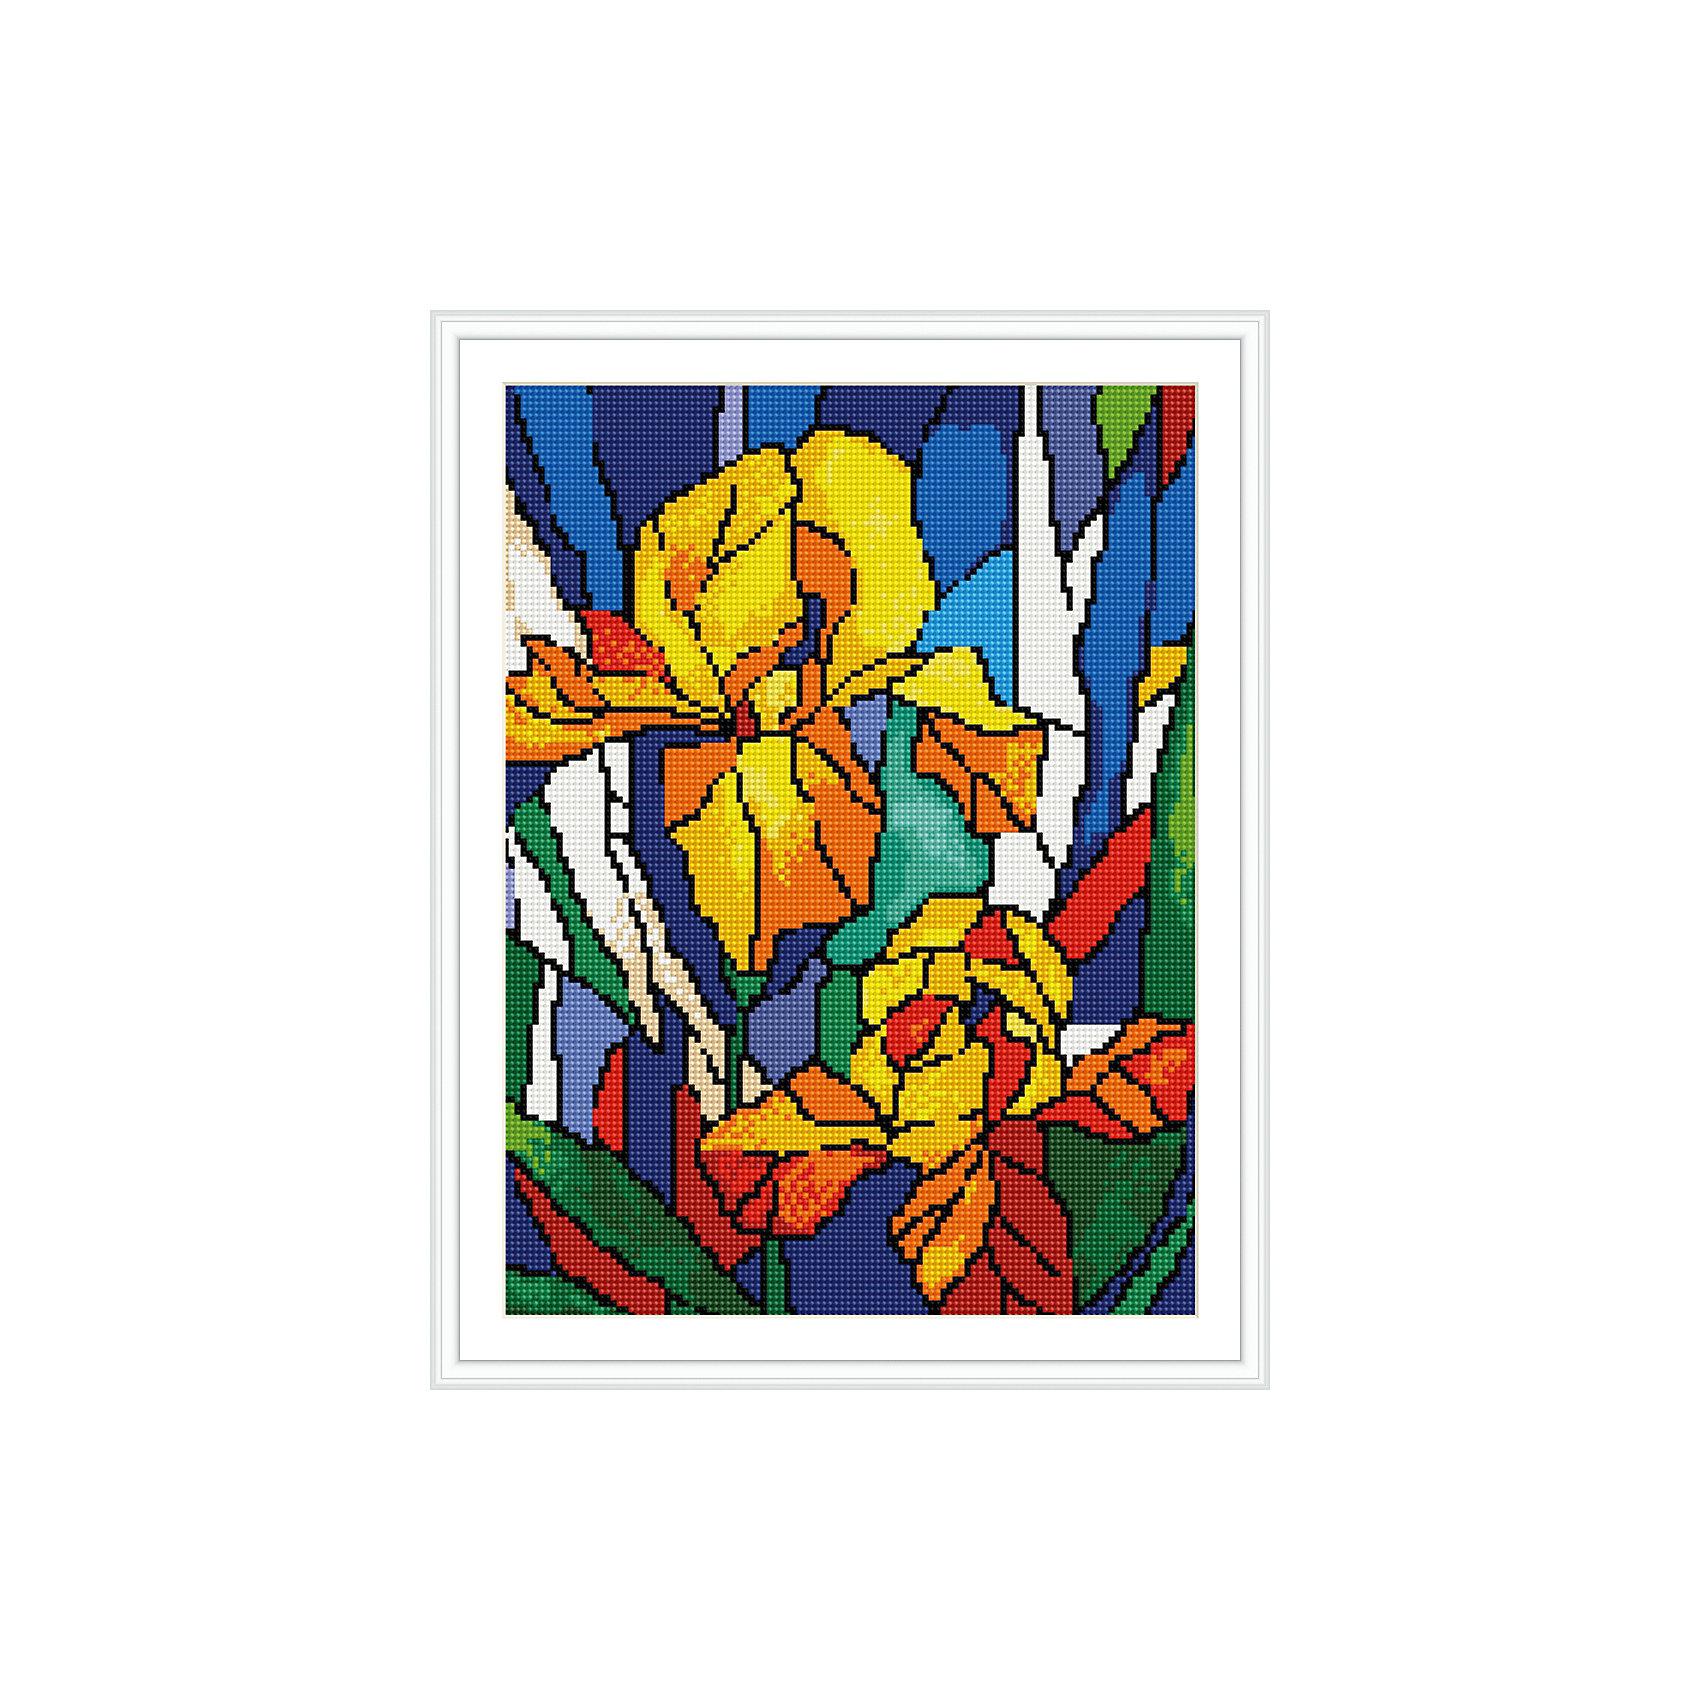 TUKZAR Алмазная мозаика по номерами Ирисы 30х40 см набор для творчества алмазная мозаика анютины глазки 30 см х 30 см